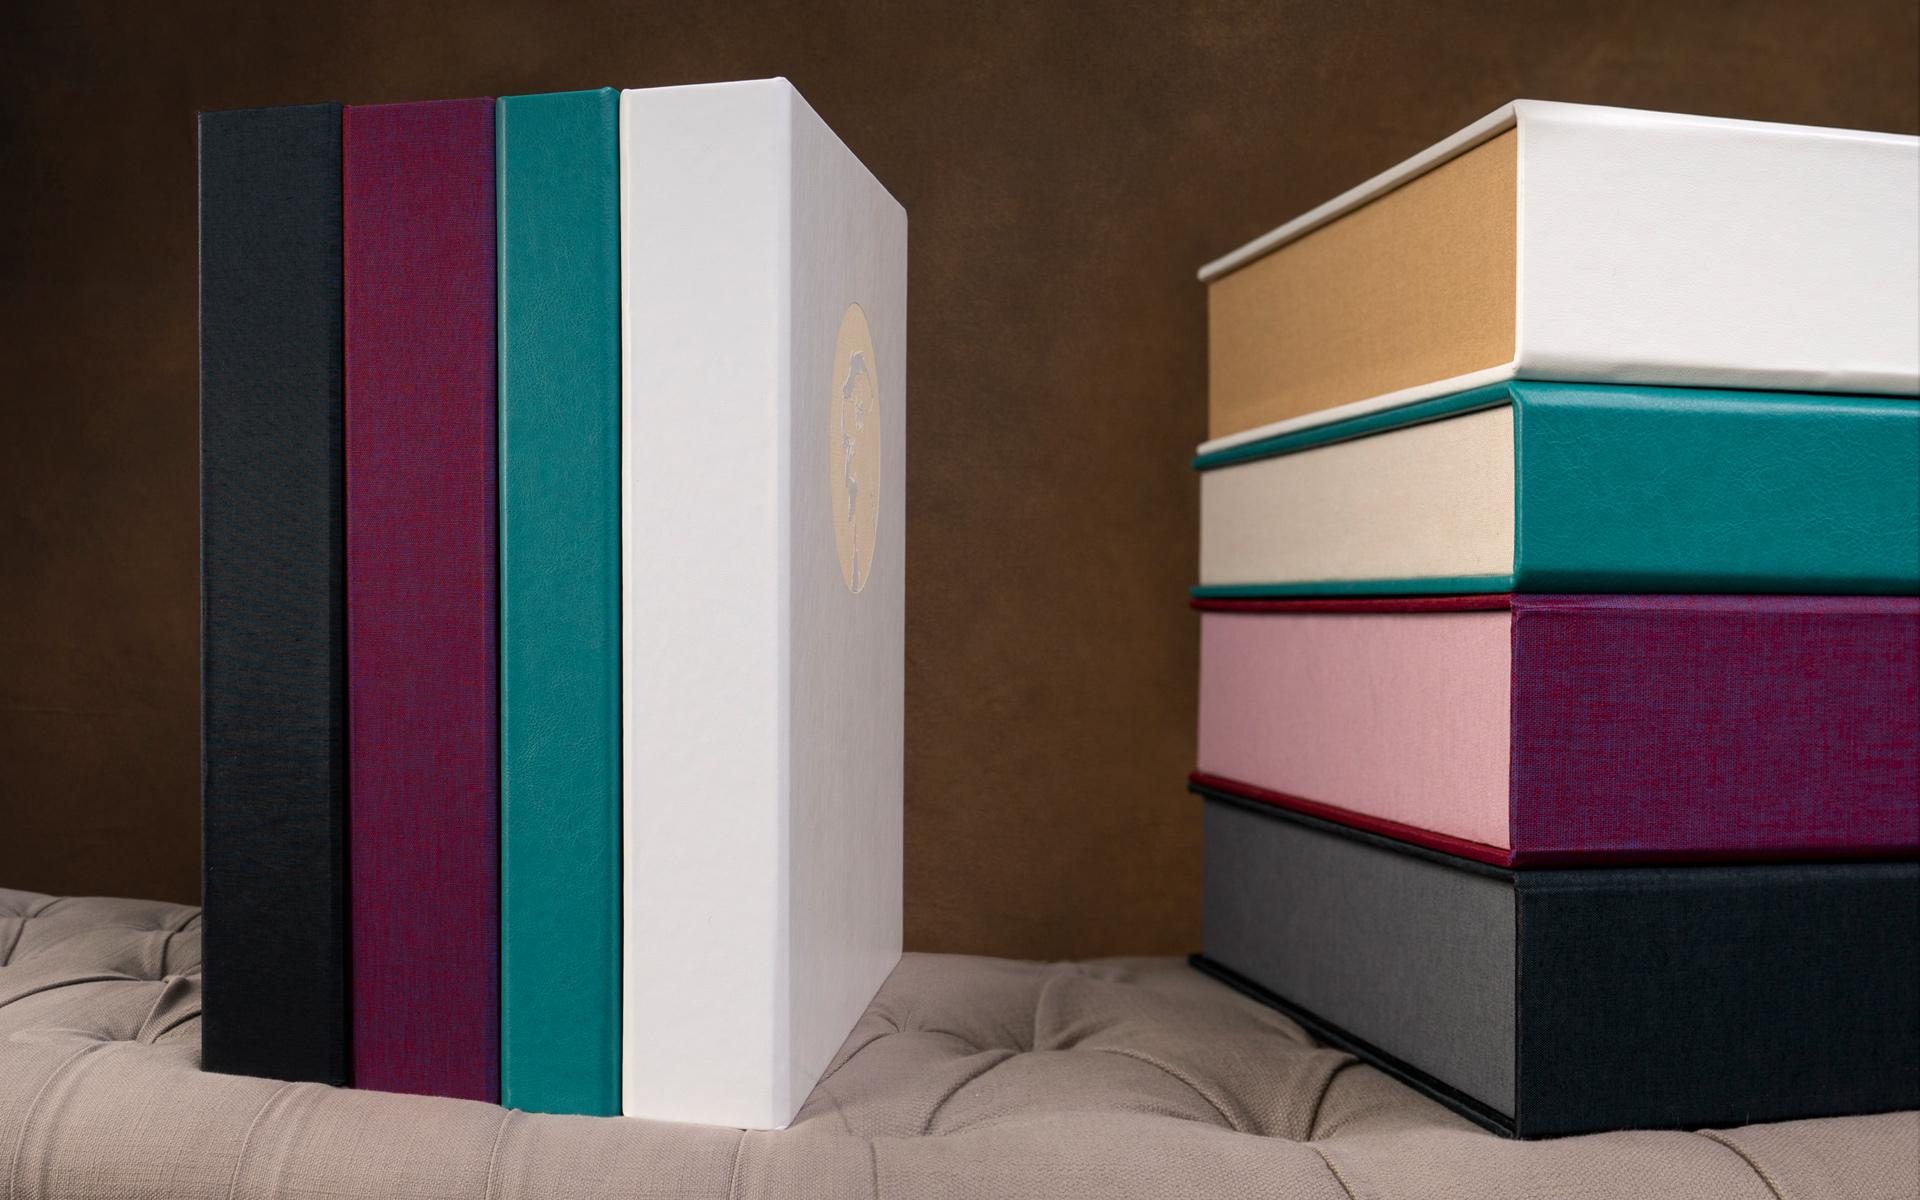 Kerto Studio premium fine art print boxes